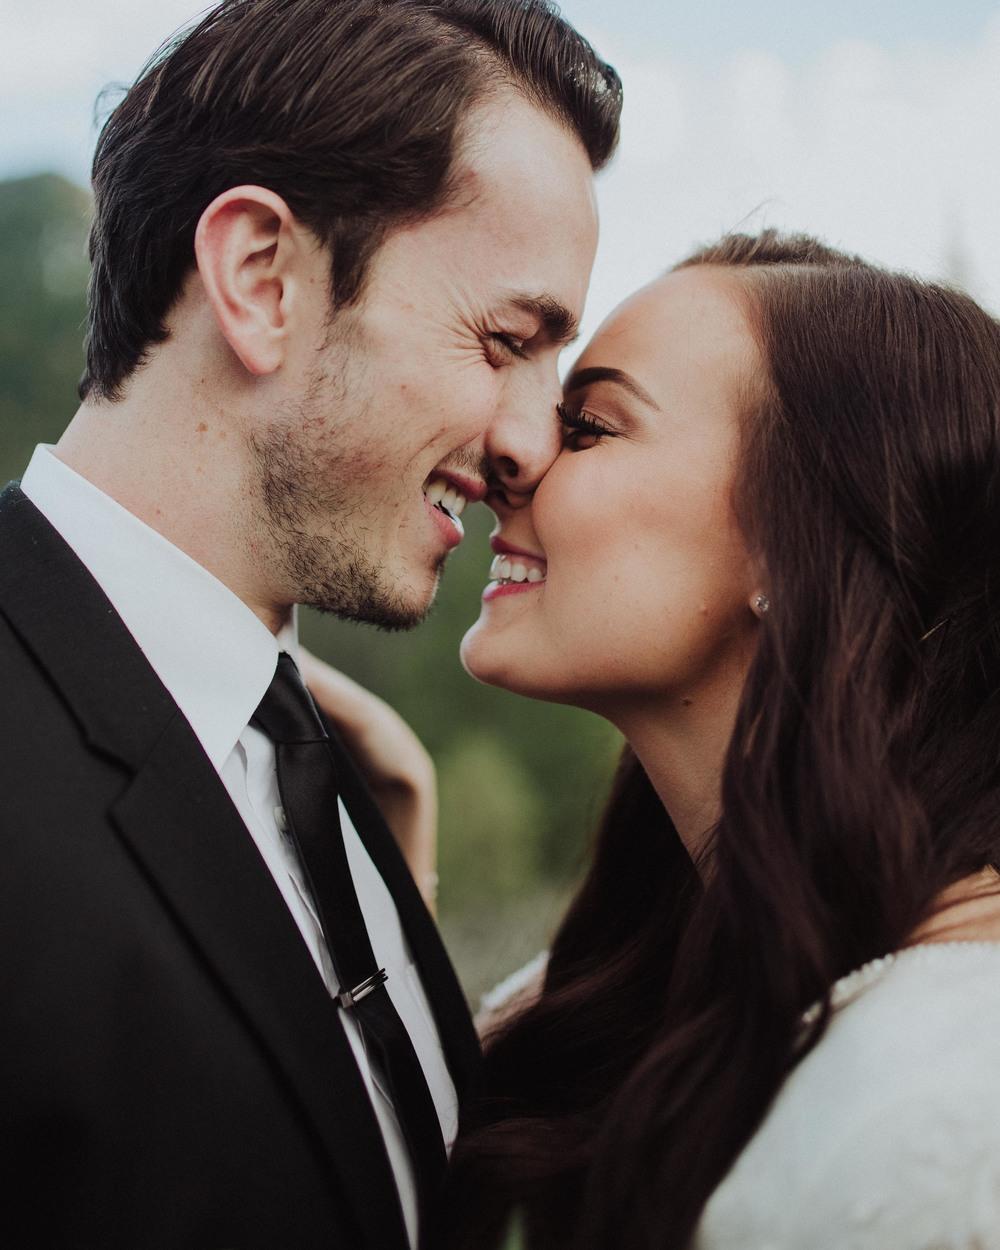 Salt Lake City Wedding Photographer-33.jpg